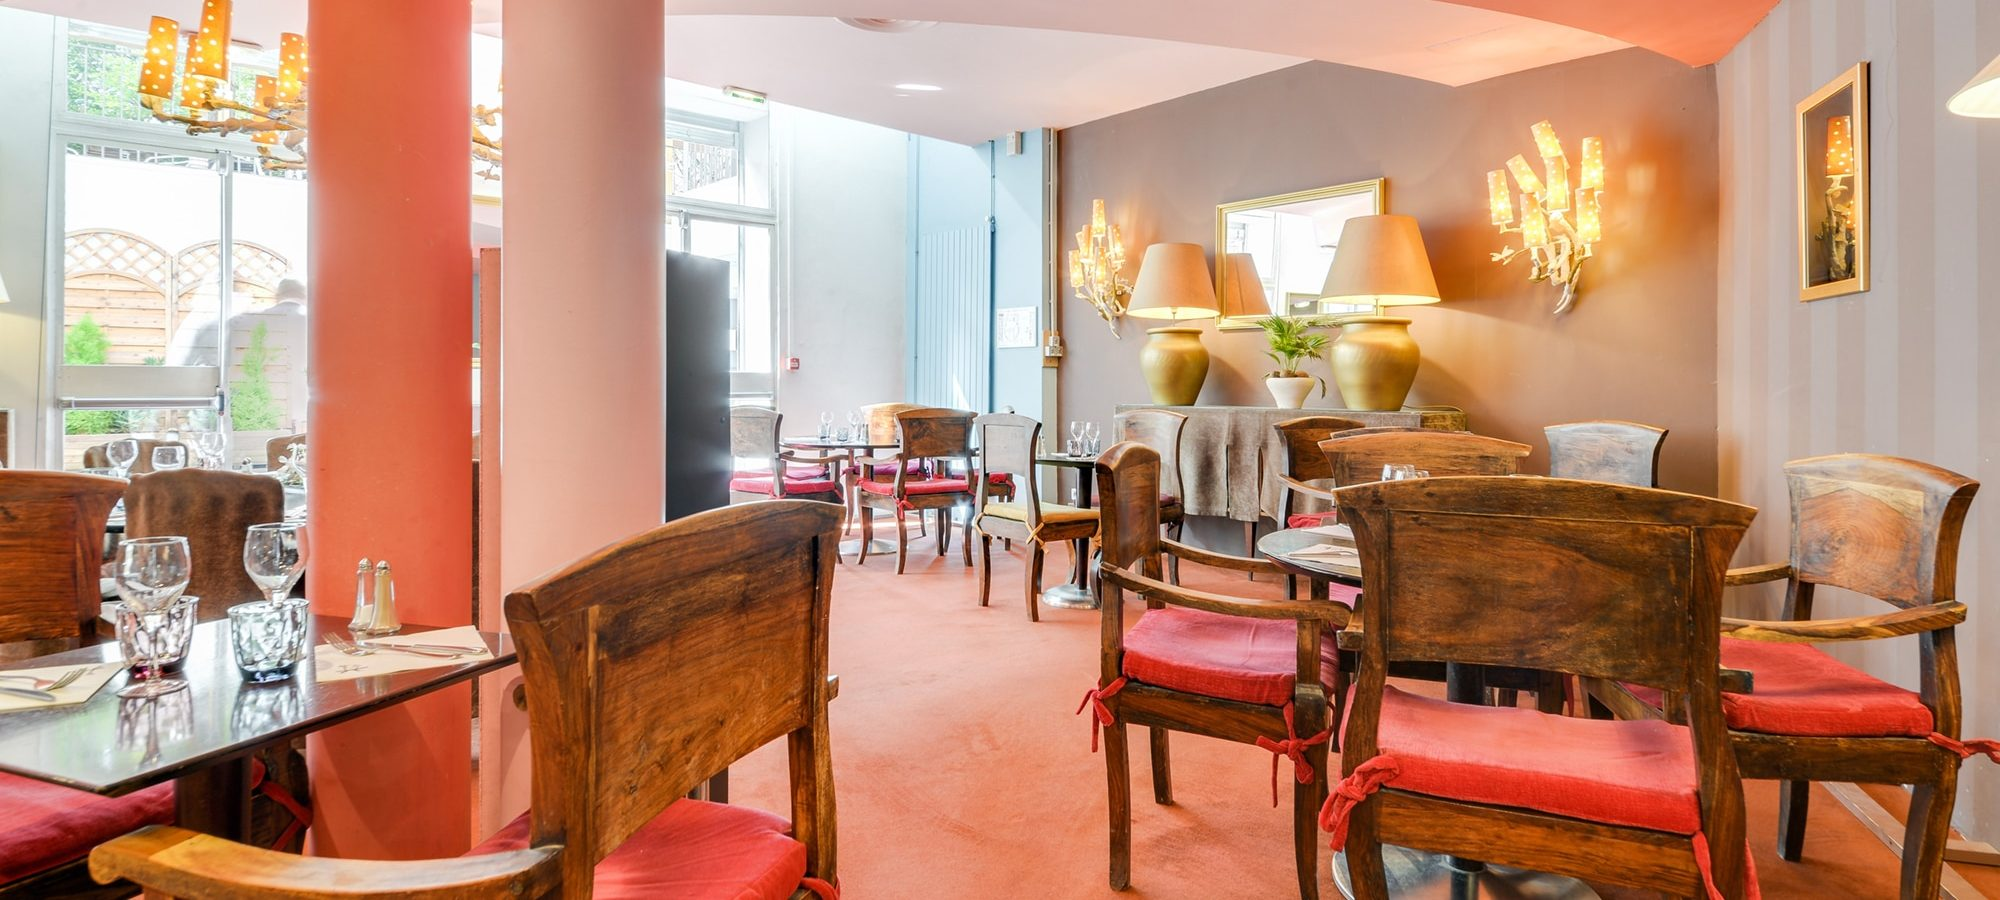 le-restaurant-du-rond-point-09-HD.jpg